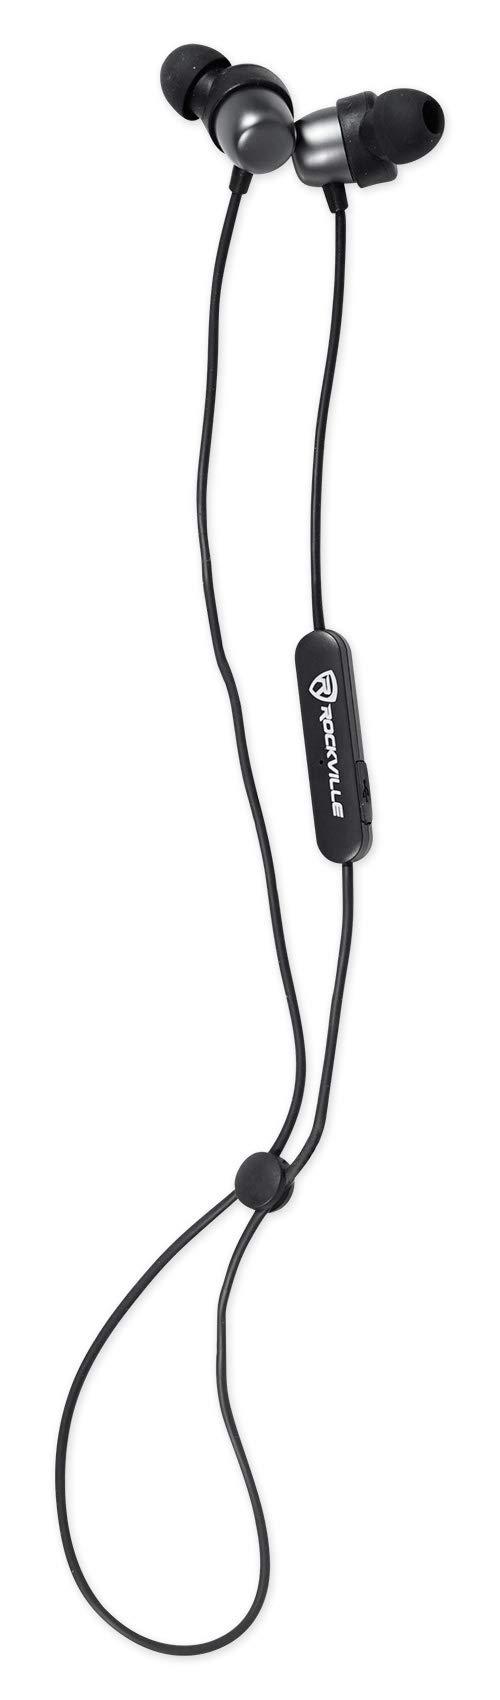 Rockville EBT35 Gunmetal Magnetic Bluetooth Earbuds Auriculares deportivos internos / IPX5